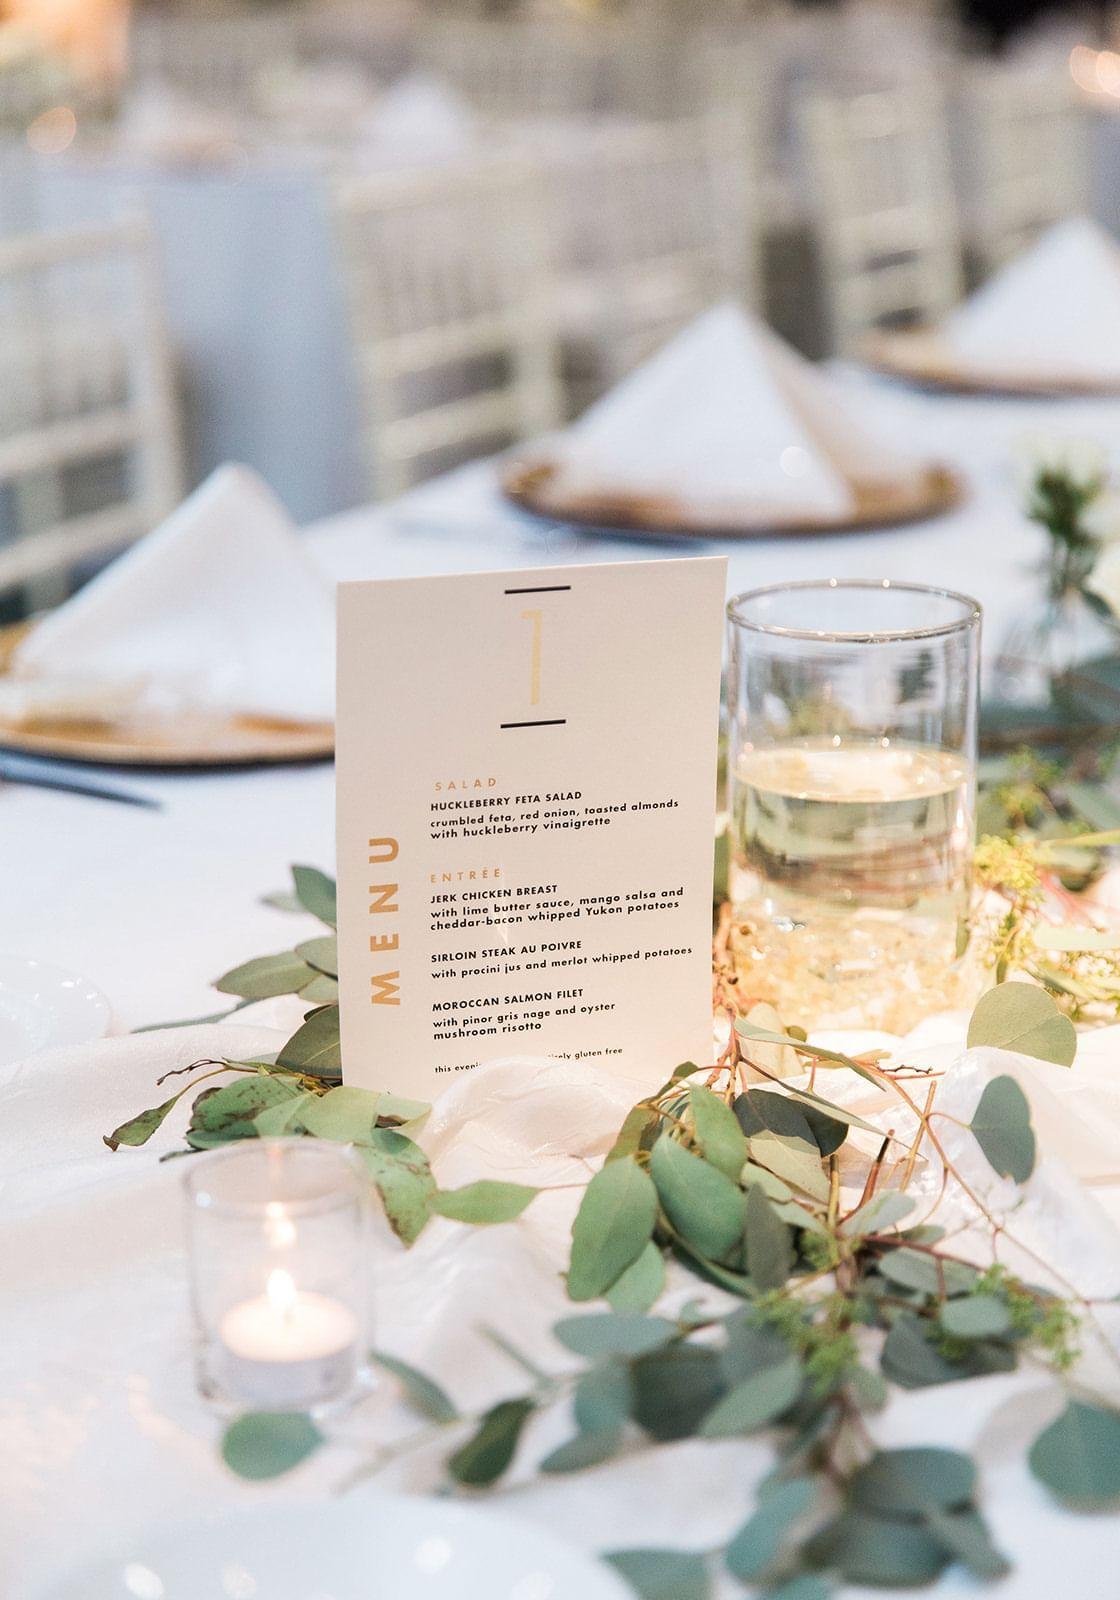 a dinner menu on a table